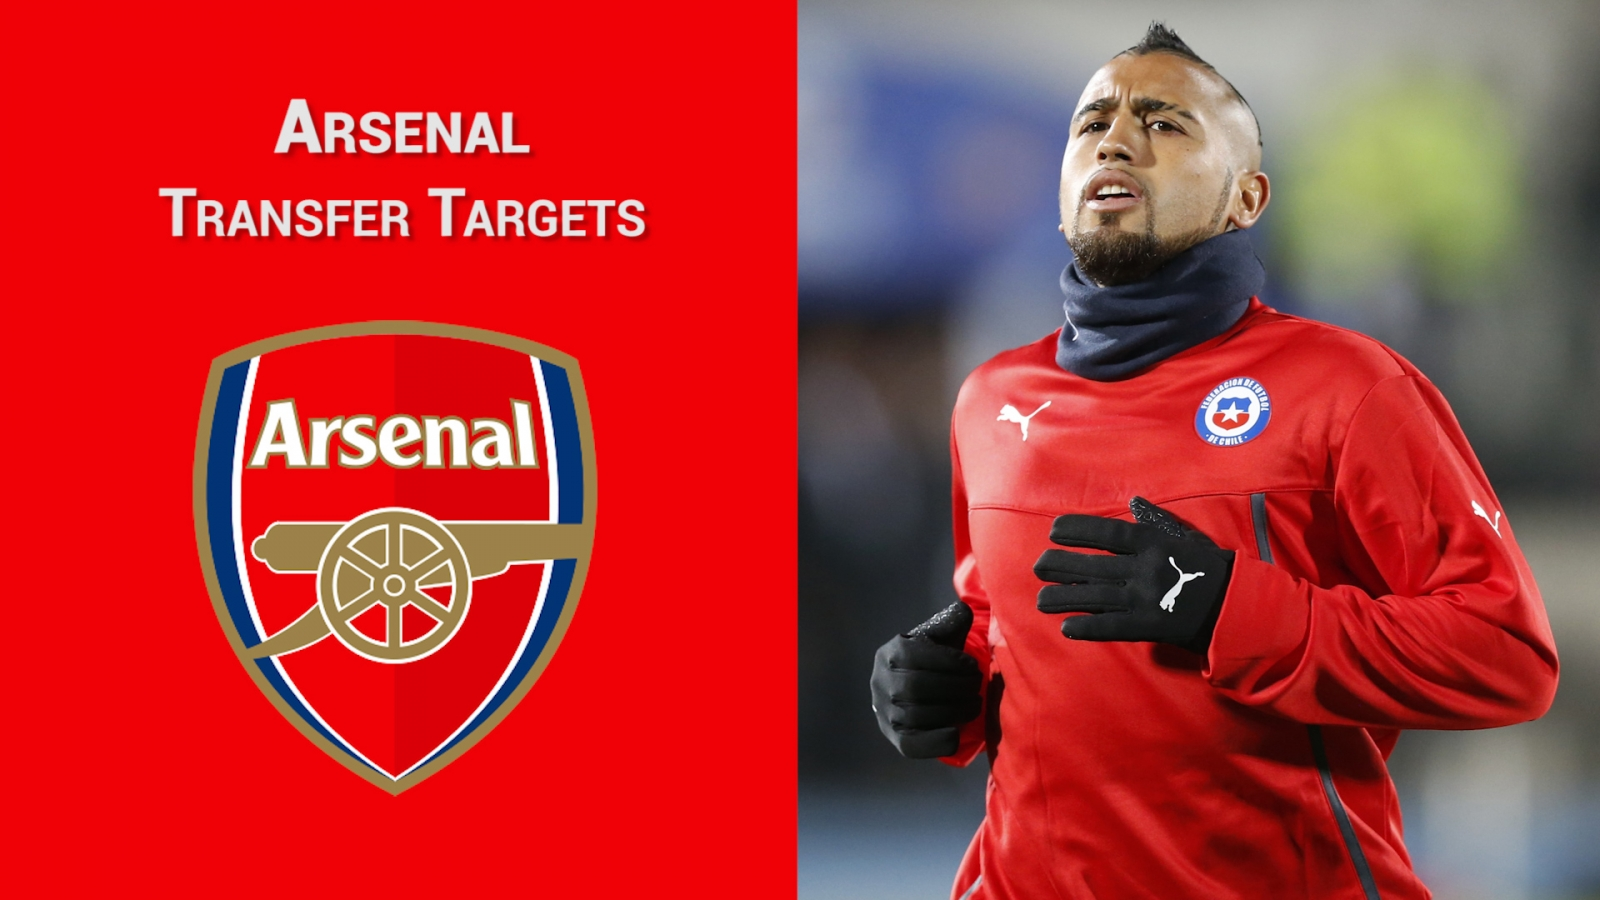 Arsenal transfer targest